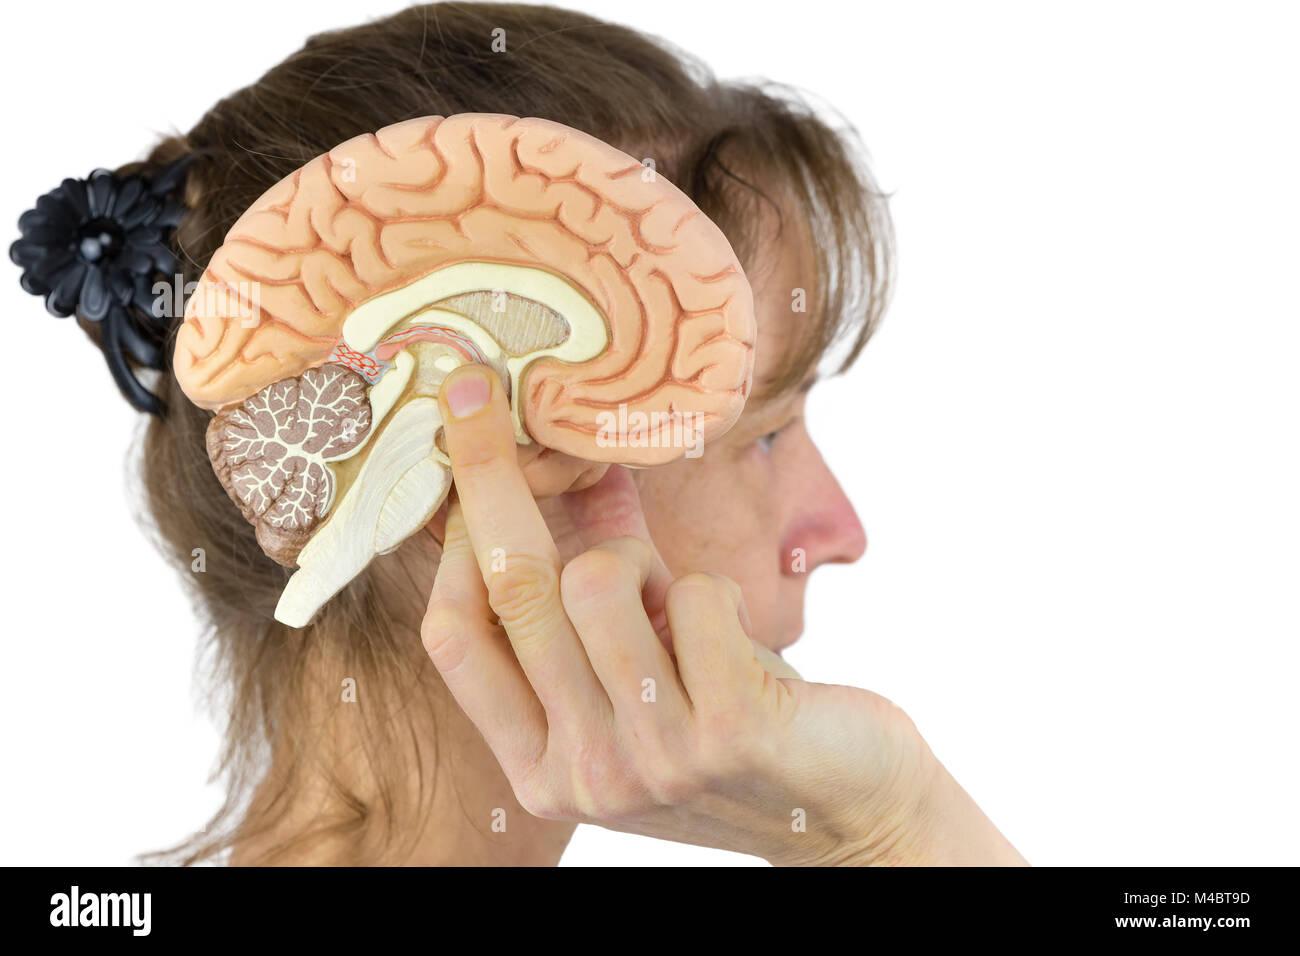 Woman holding hemisphere model  against head on white - Stock Image